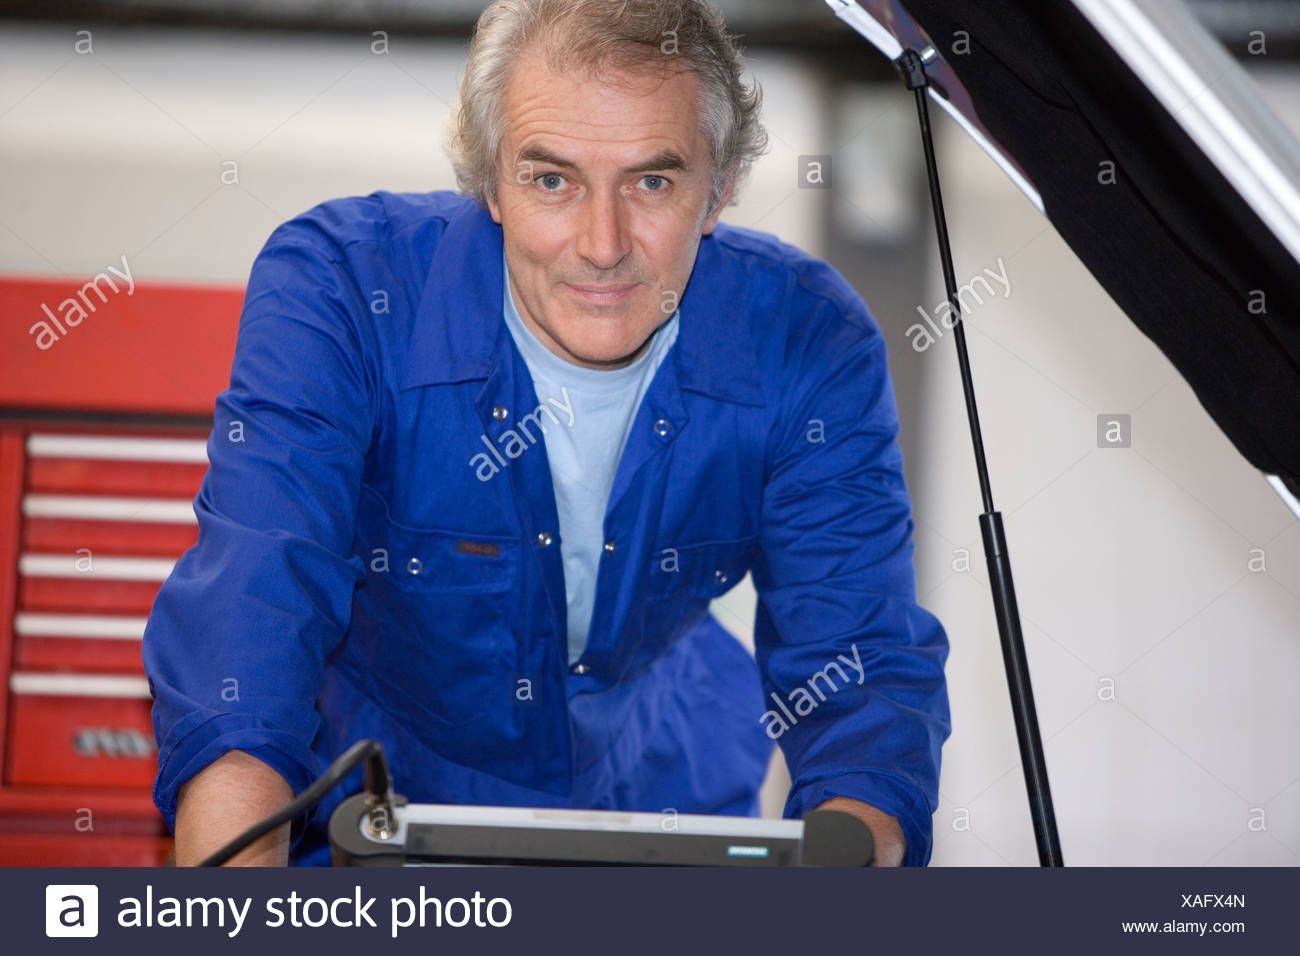 Mechanic with diagnostic computer by car with open bonnet, portrait - Stock Image